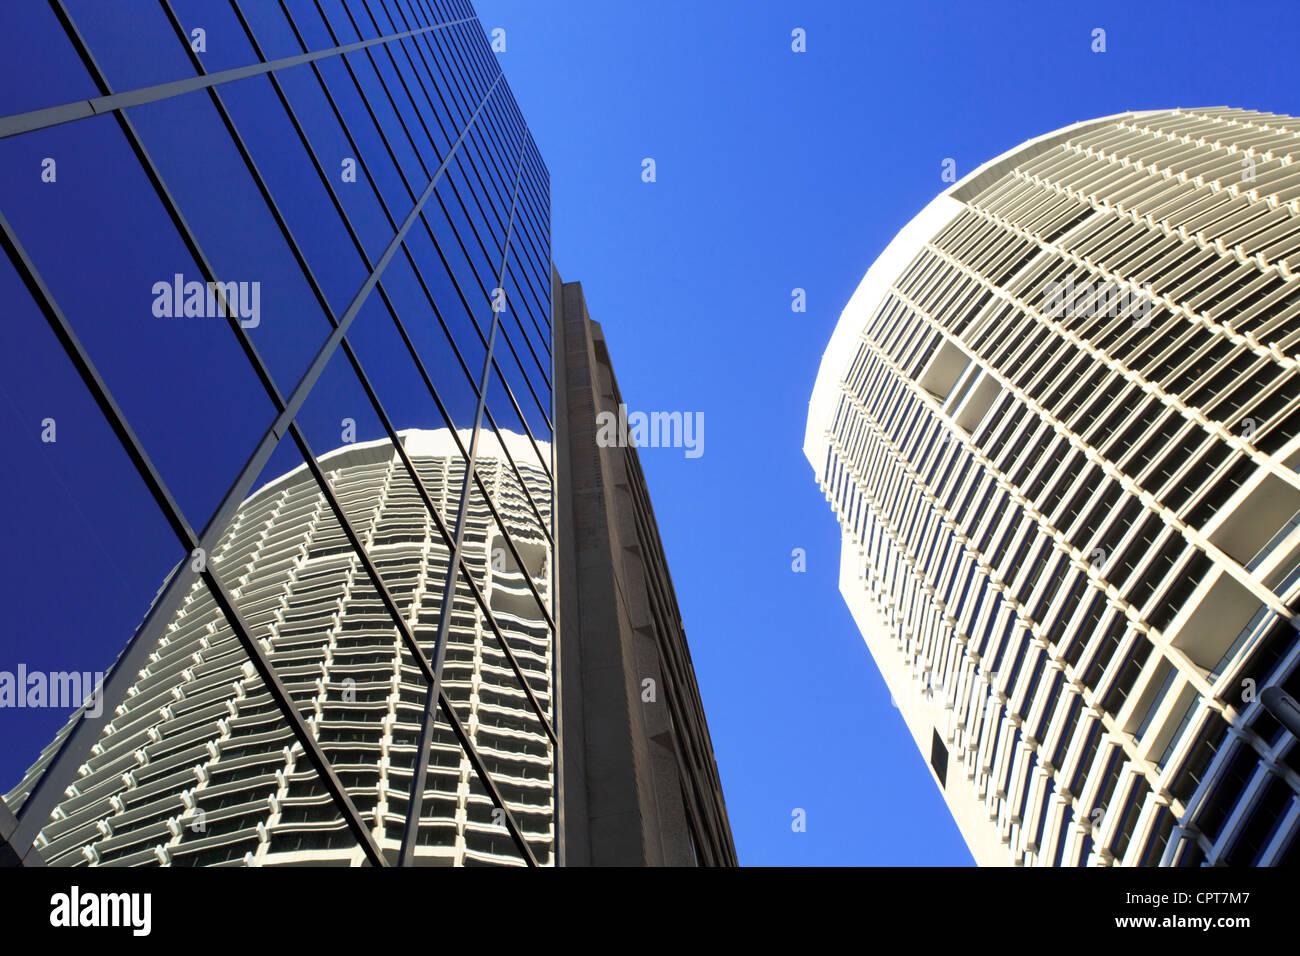 Tall buildings in Sydney's CBD. - Stock Image